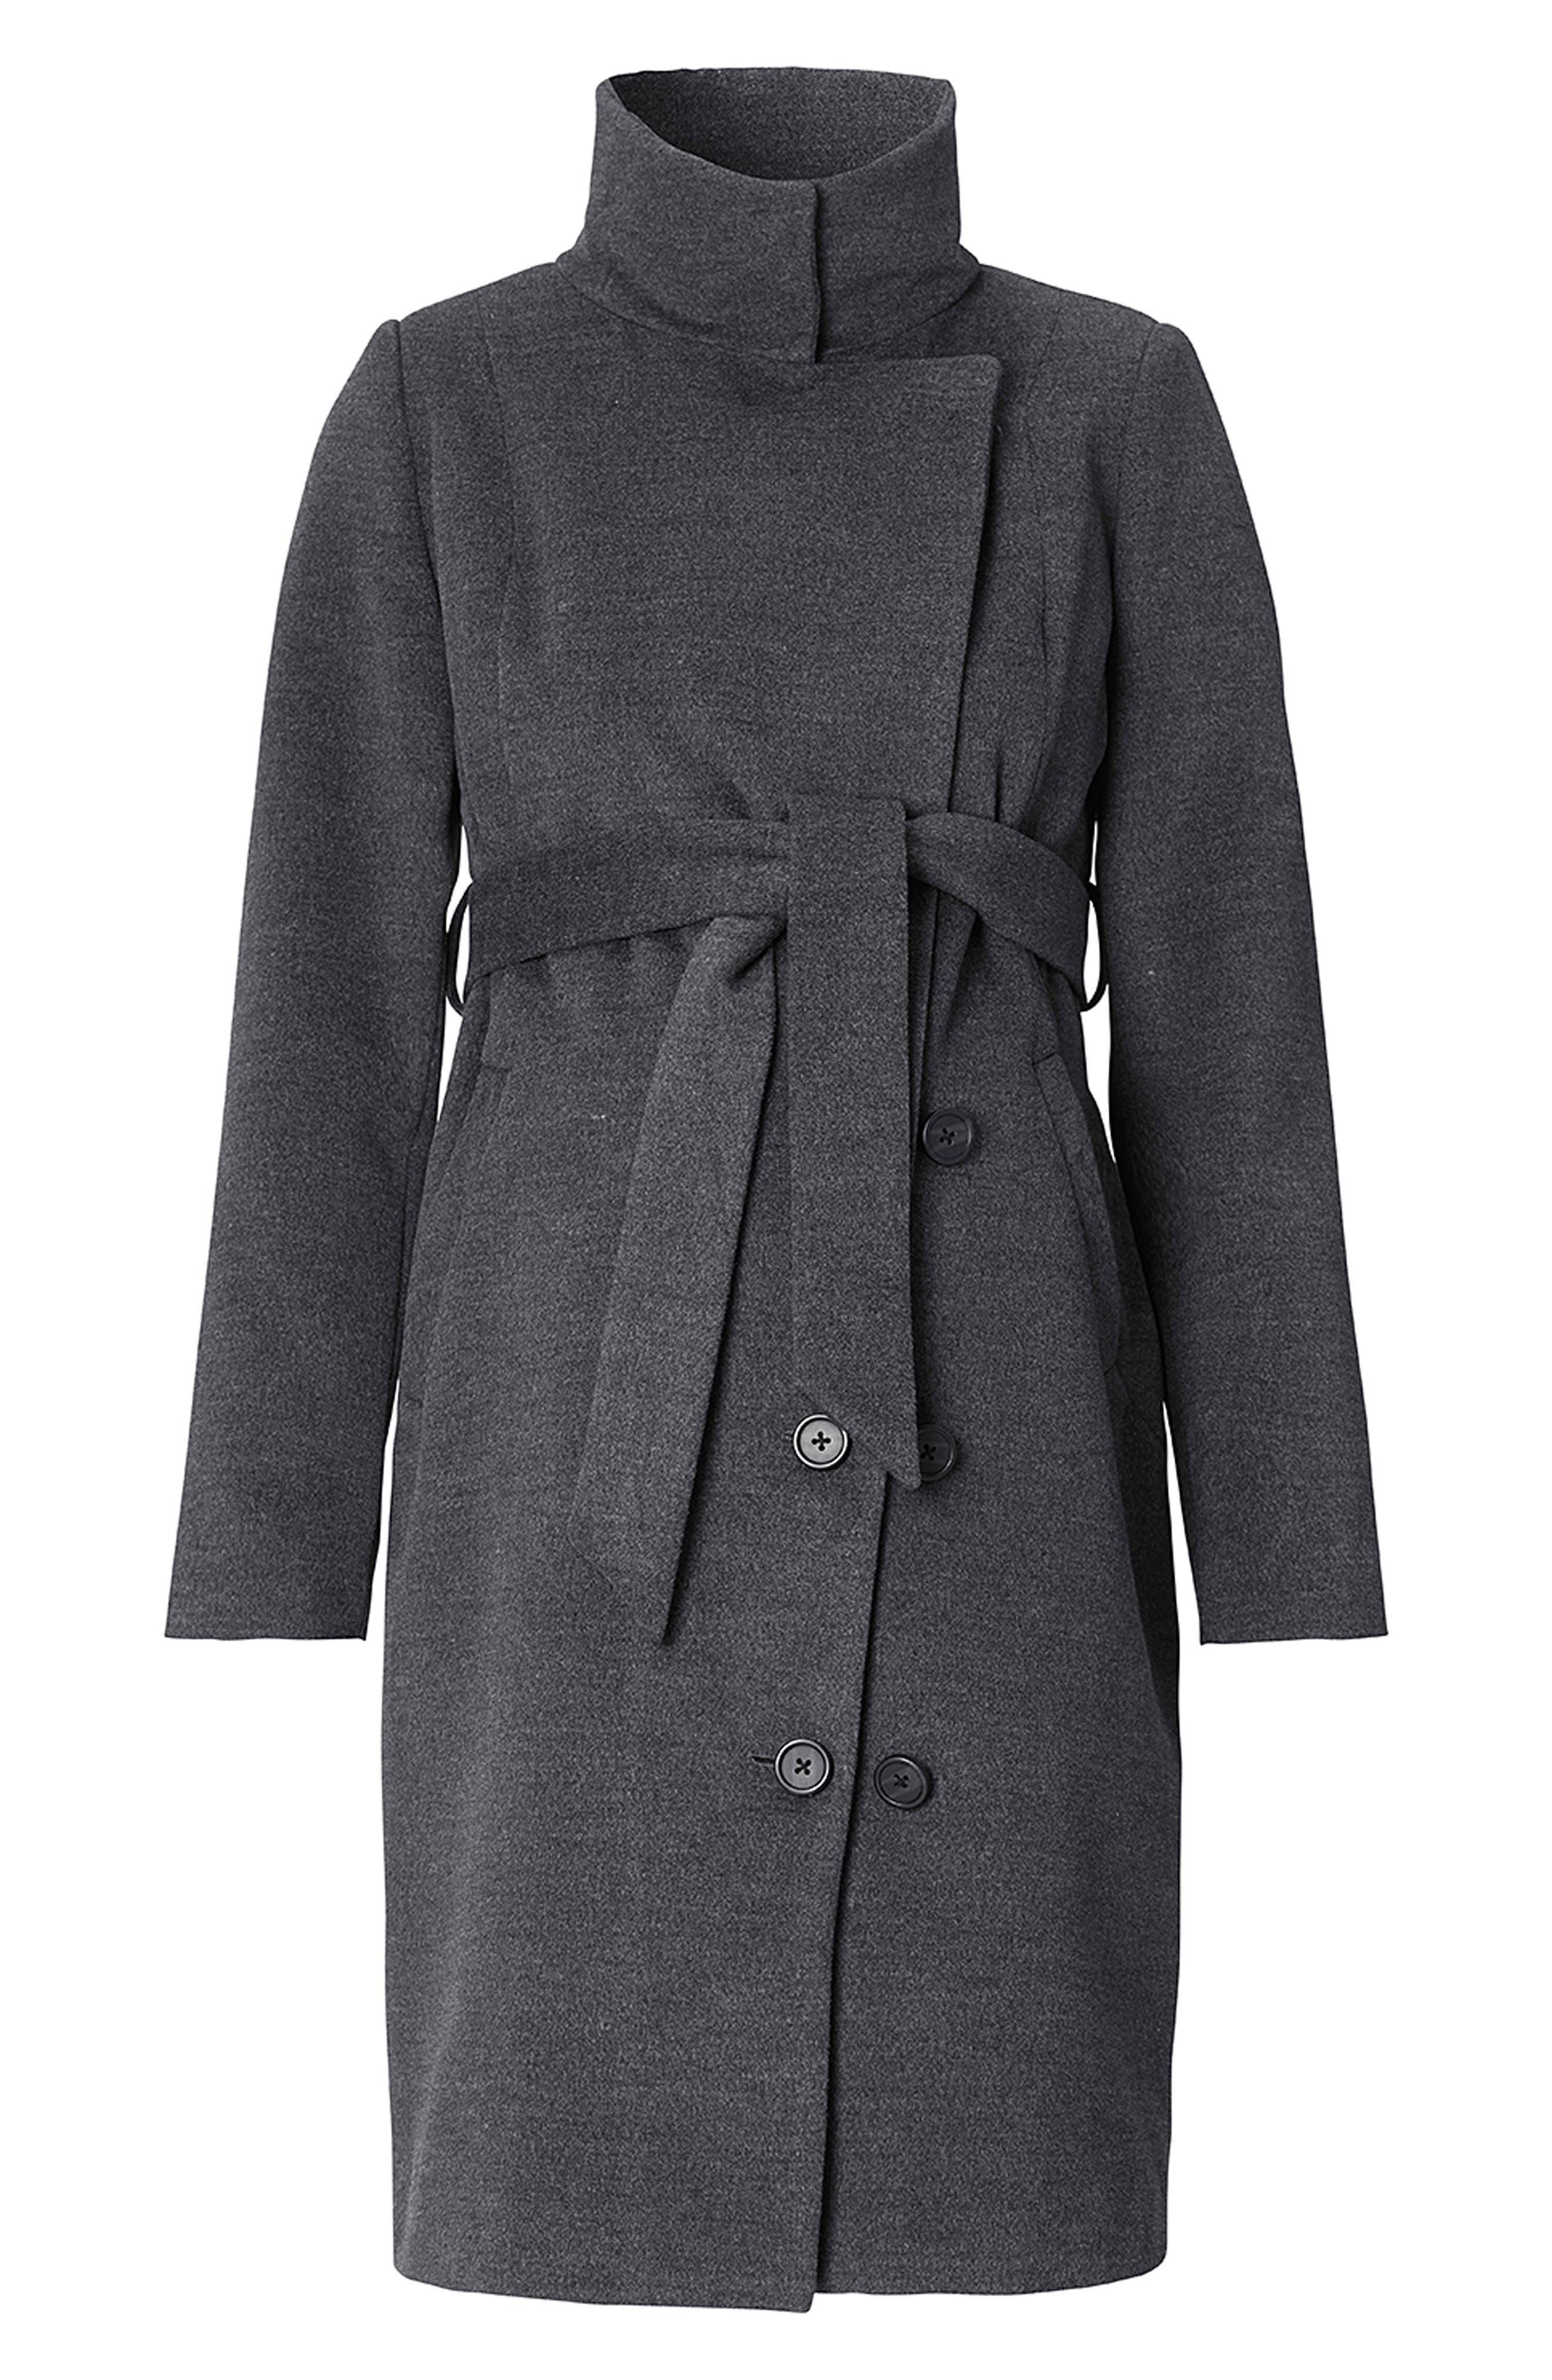 Ilena 2 Maternity Coat,                             Main thumbnail 1, color,                             BLACK MELANGE